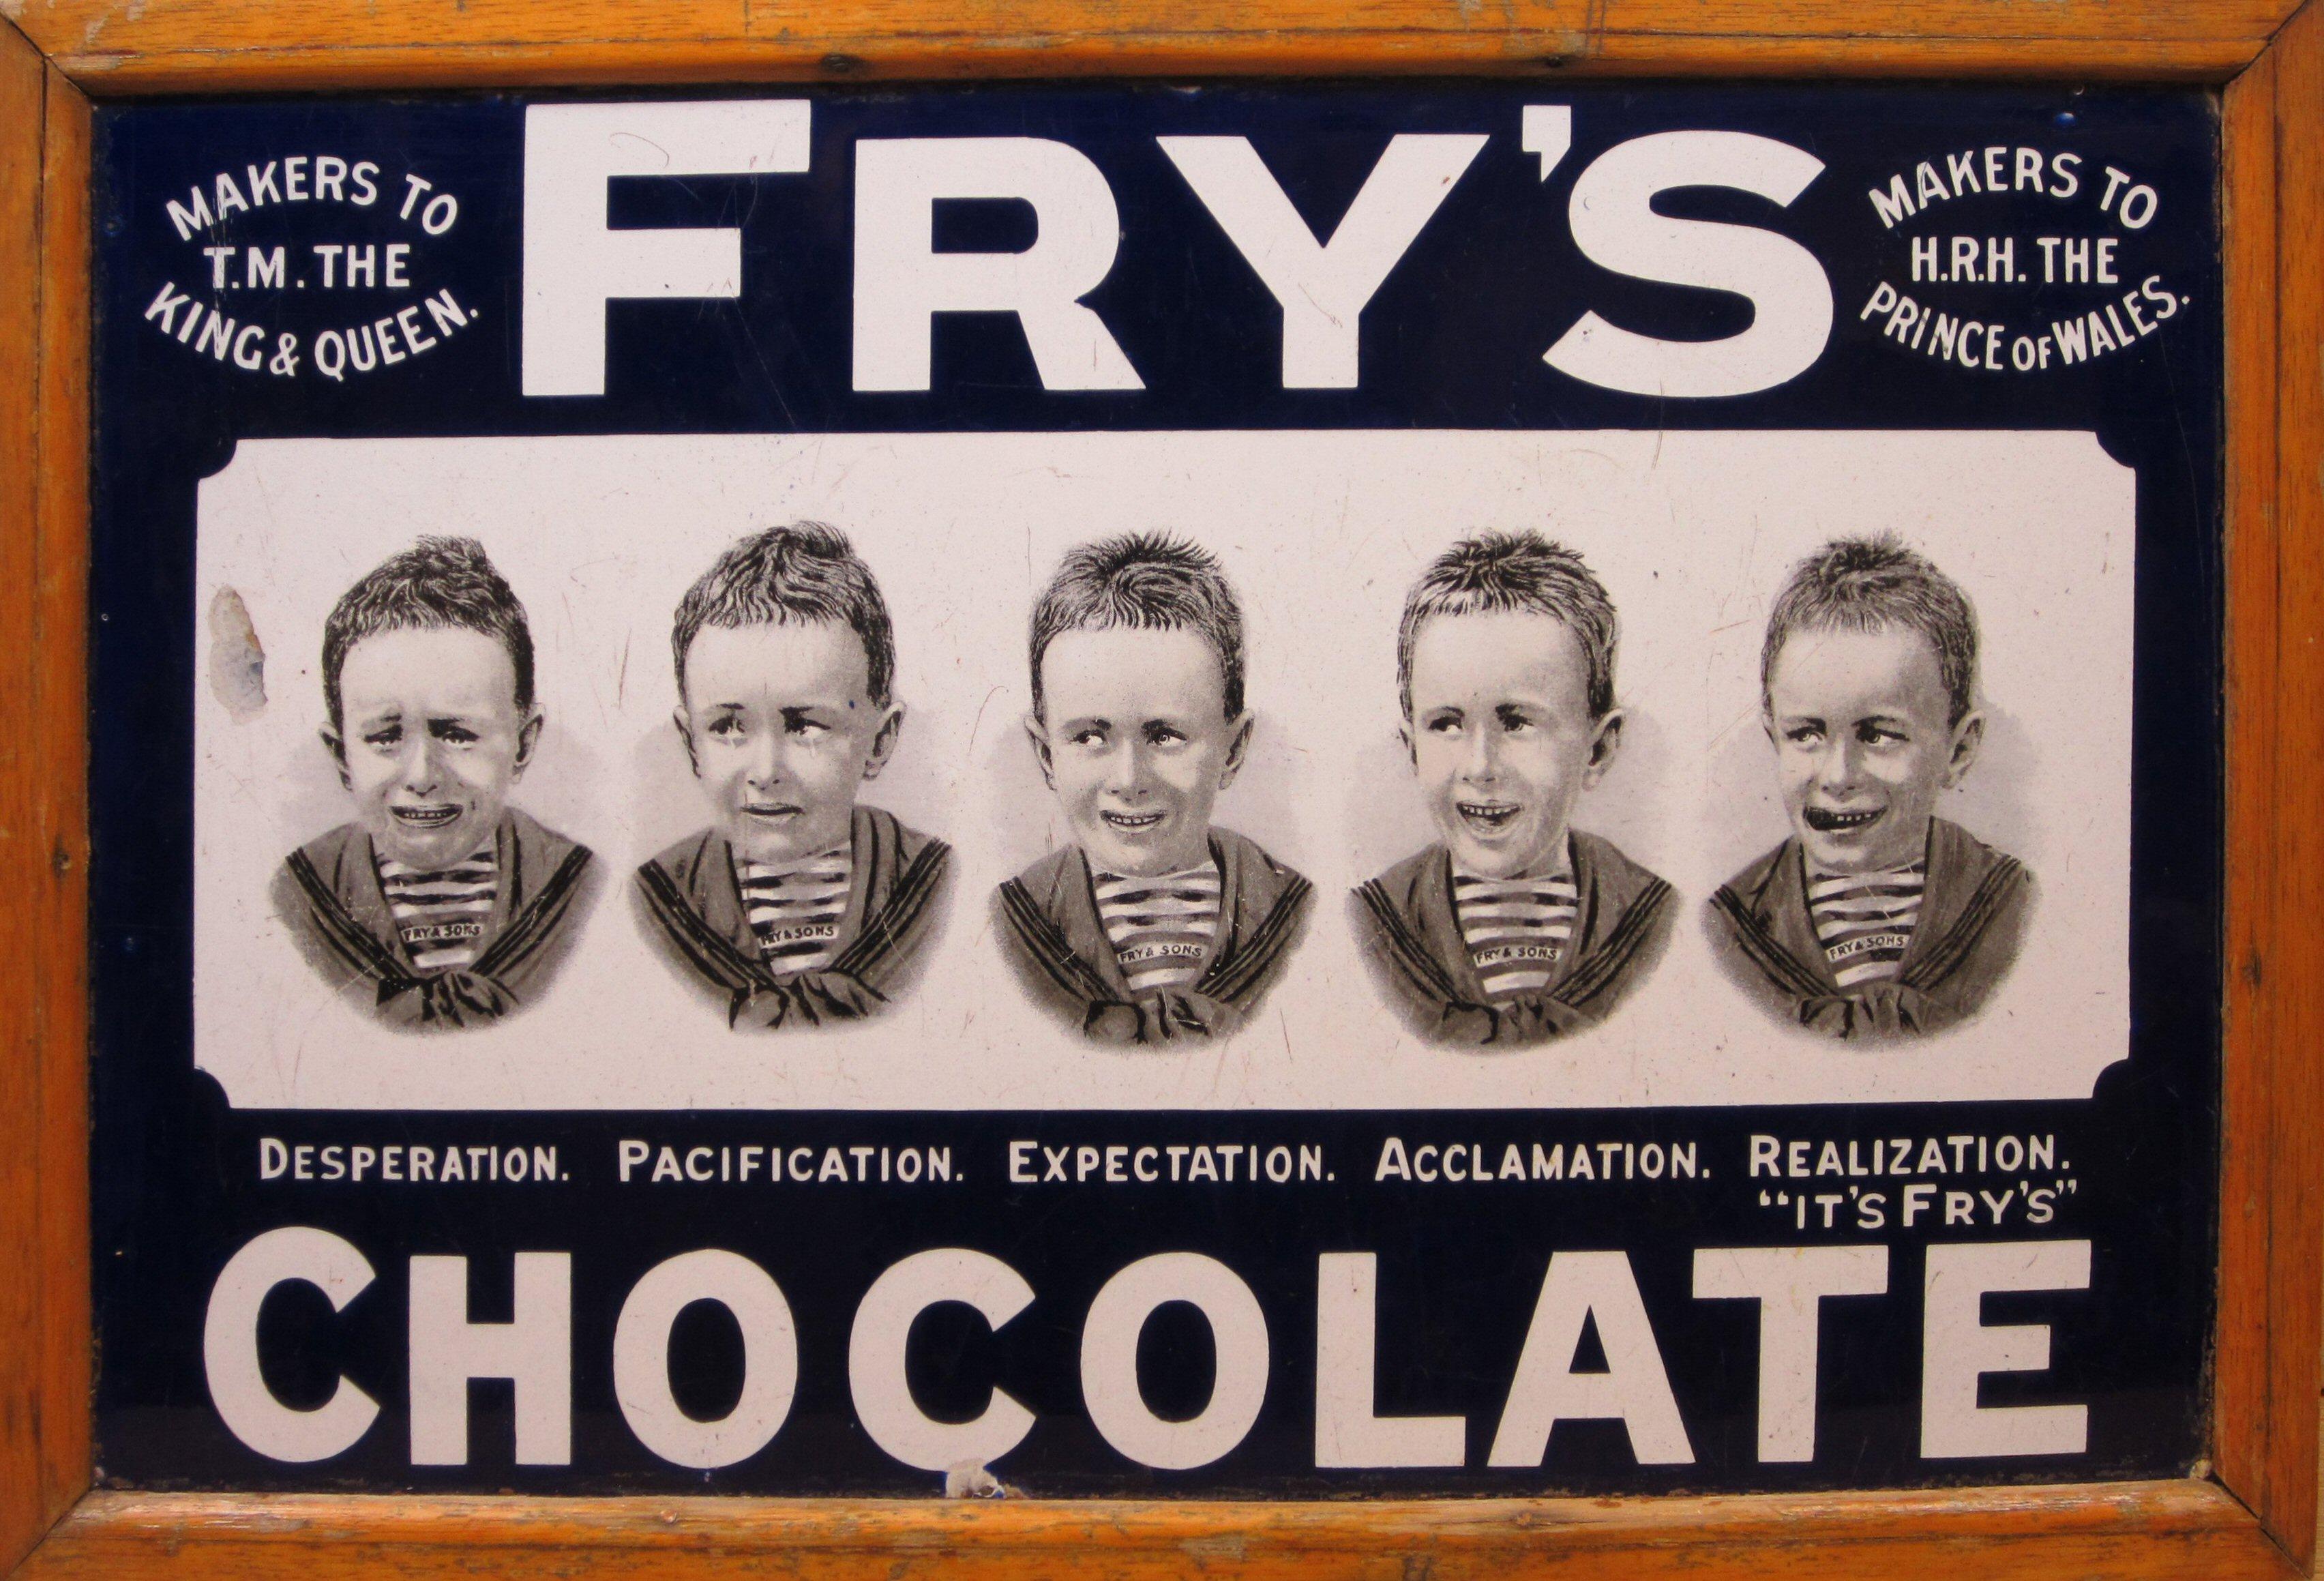 Lot 514 Frys Chocolate